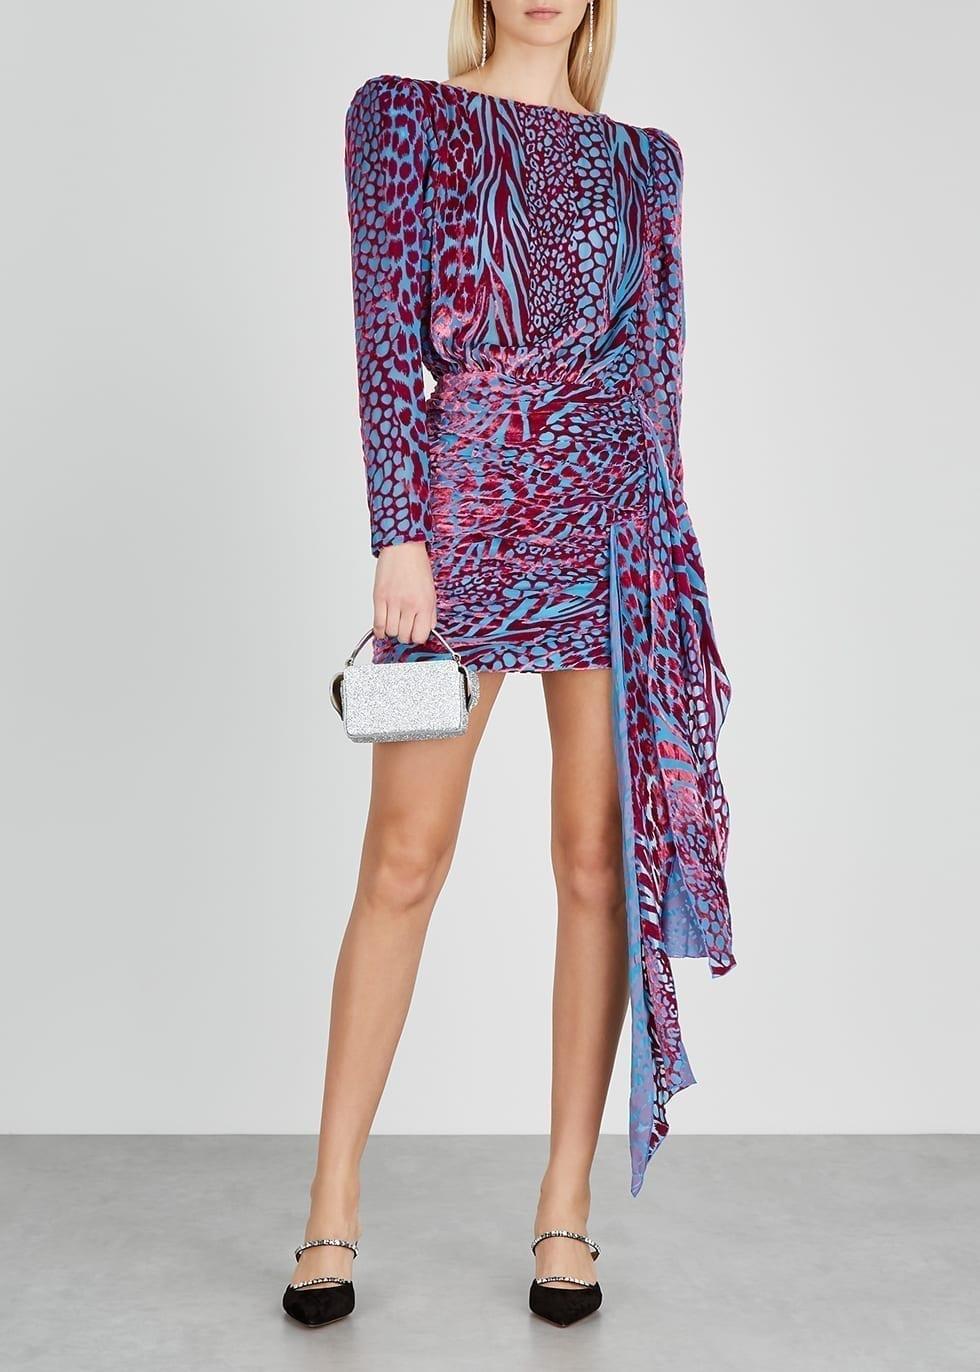 GIUSEPPE DI MORABITO Blue And Pink Animal-devoré Mini Dress